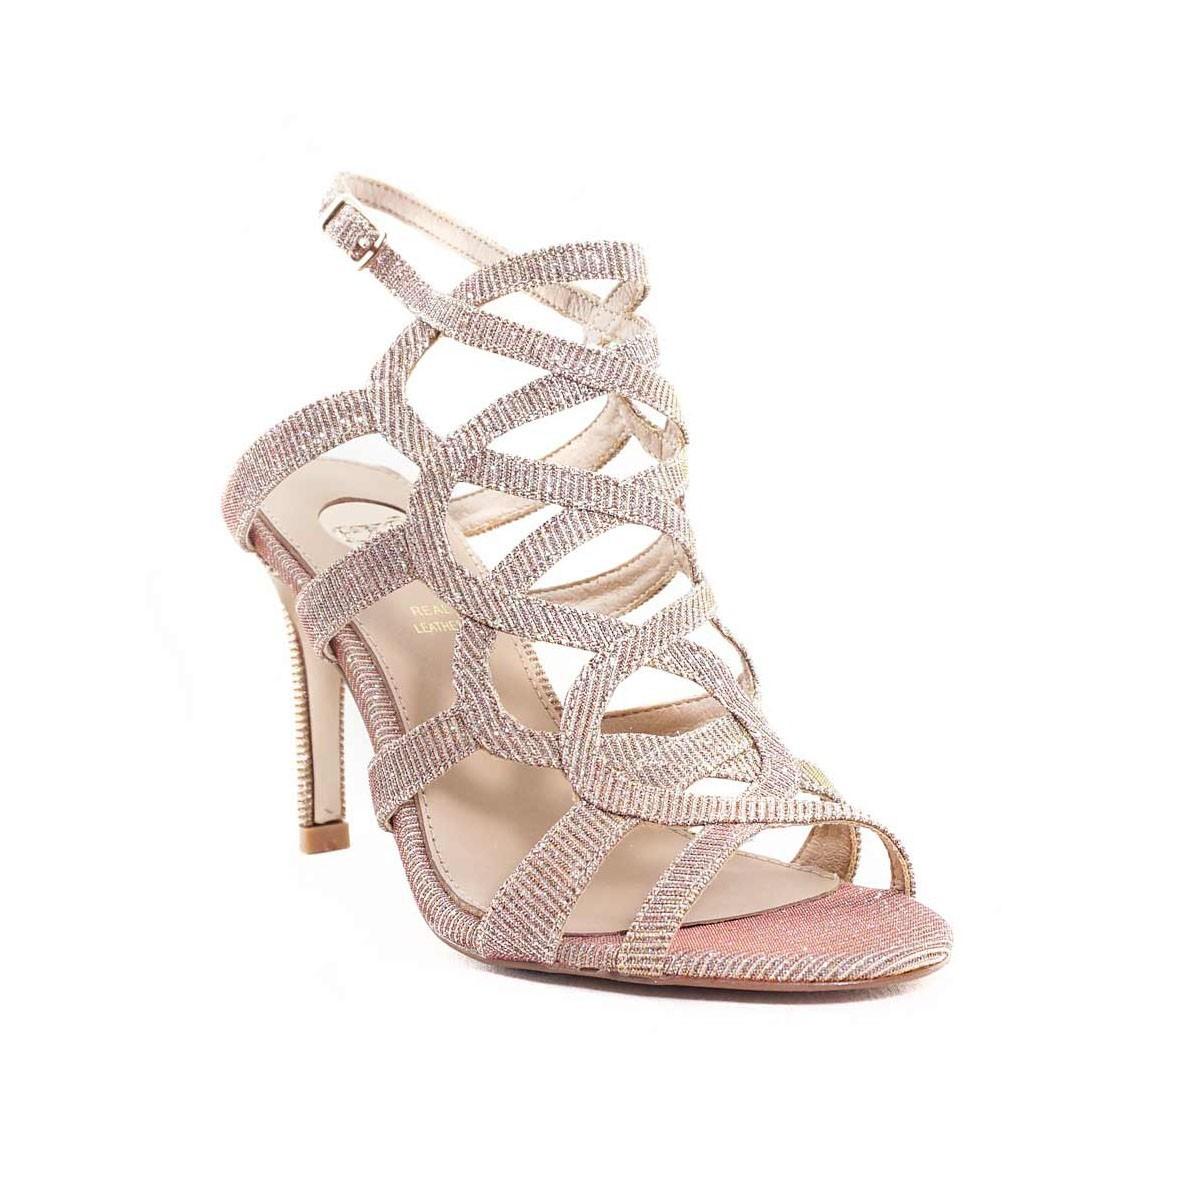 a5ed0981681 EXE Shoes Πέδιλα Γυναικεία REBECA-738 Nude Ιριδίζον G4700738562 ...